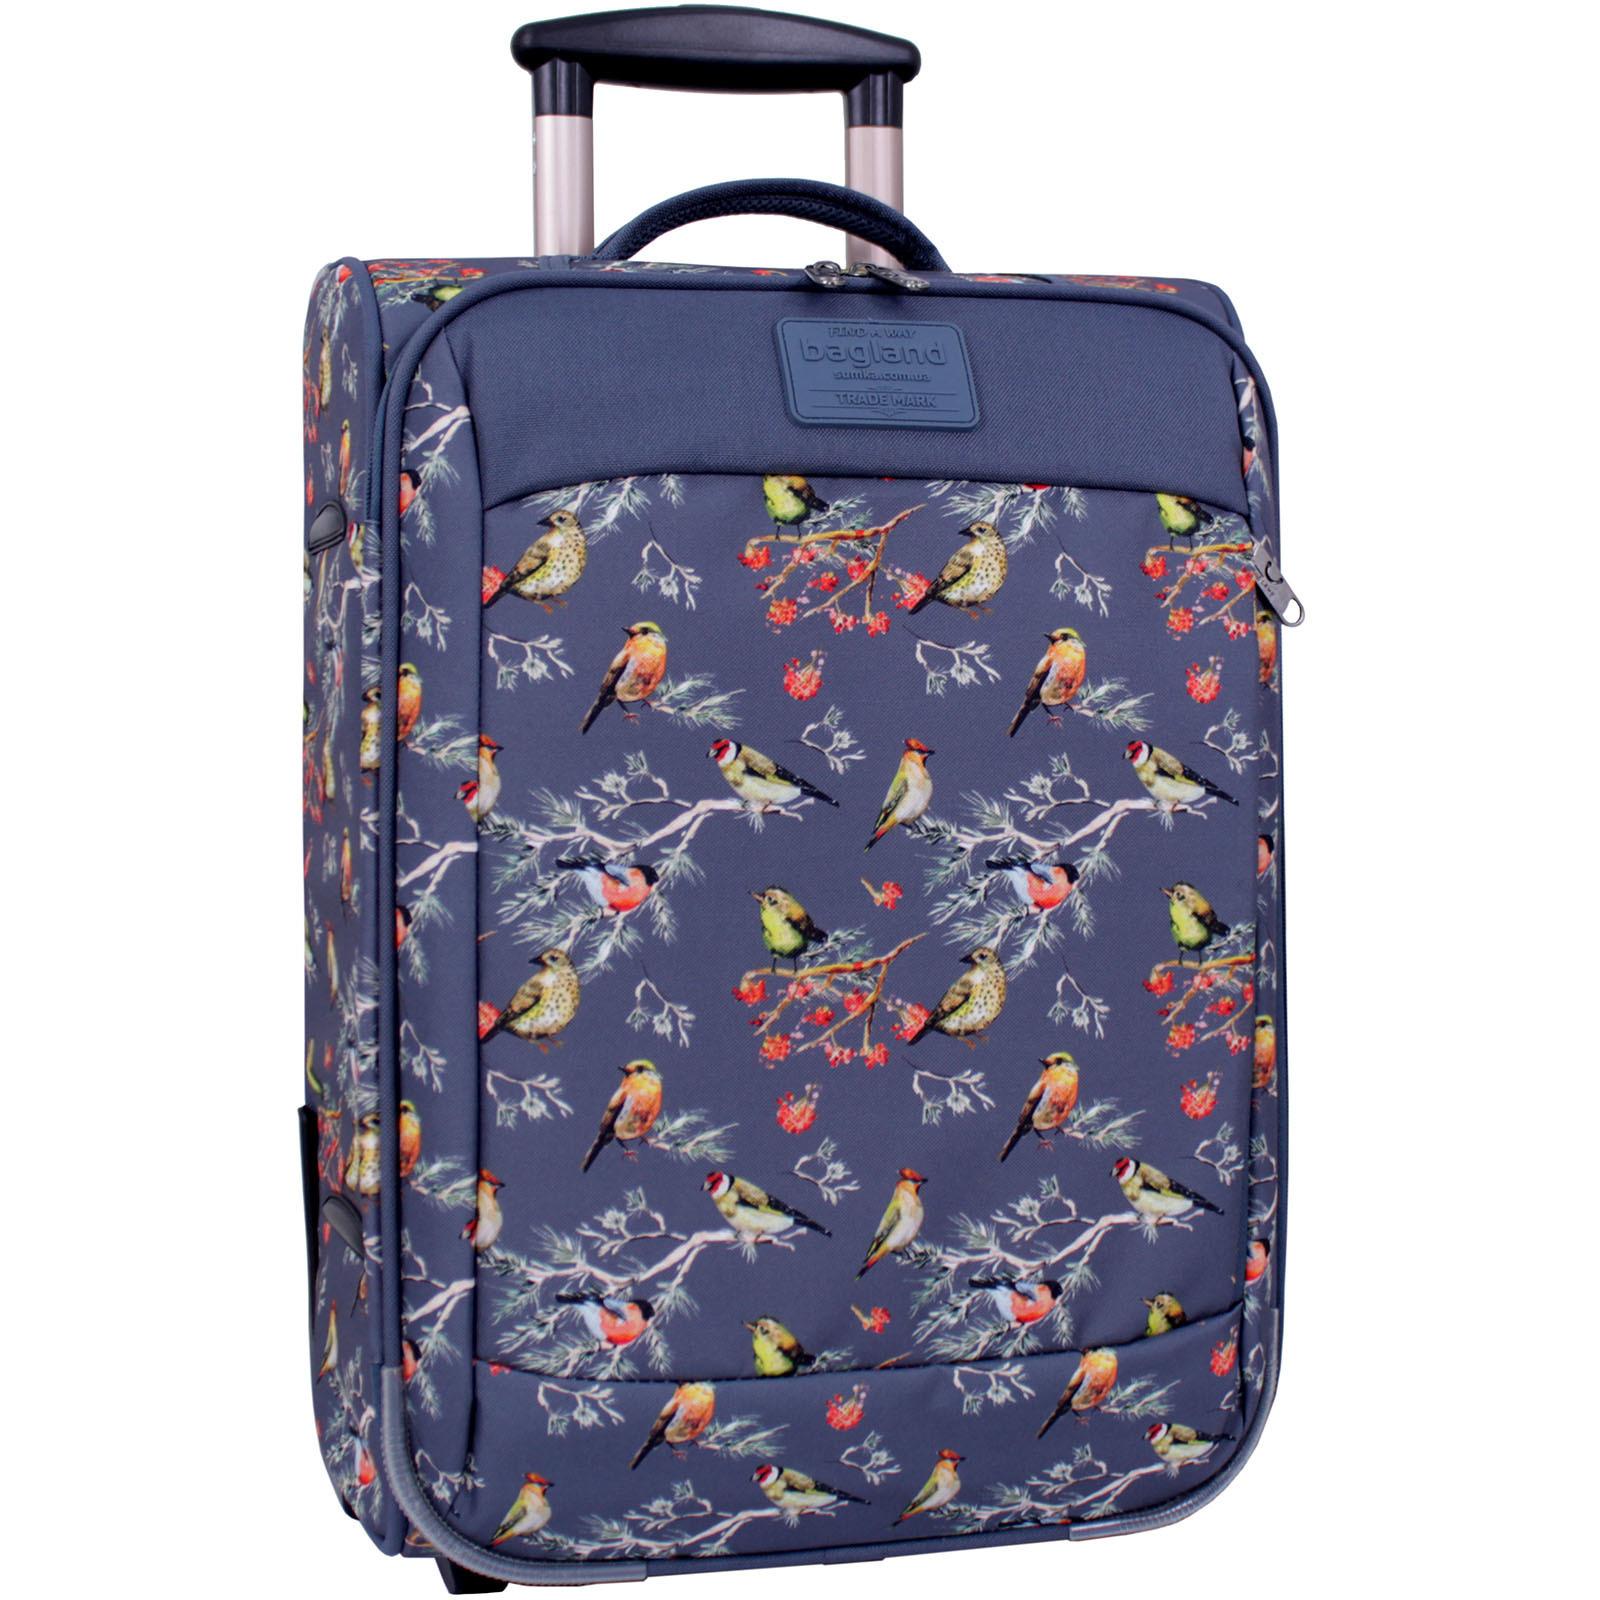 Дорожные чемоданы Чемодан Bagland Vichenzo 32 л. сублімація 445 (0037666194) IMG_4066_суб.445_.JPG